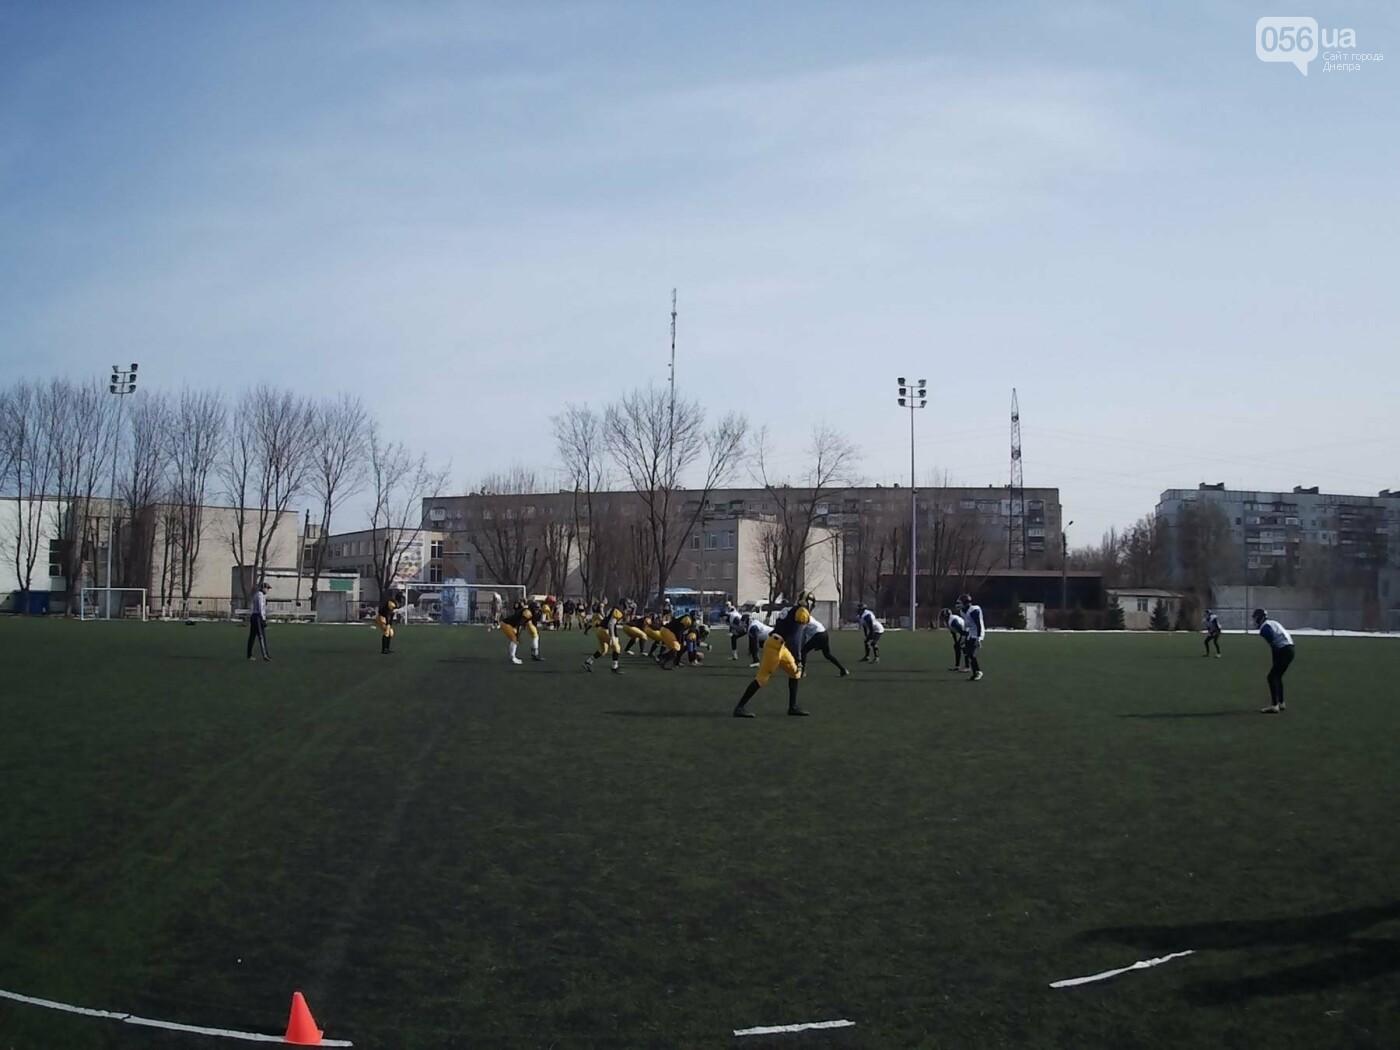 В Днепре открылся сезон американского футбола (ФОТО, ВИДЕО), фото-5